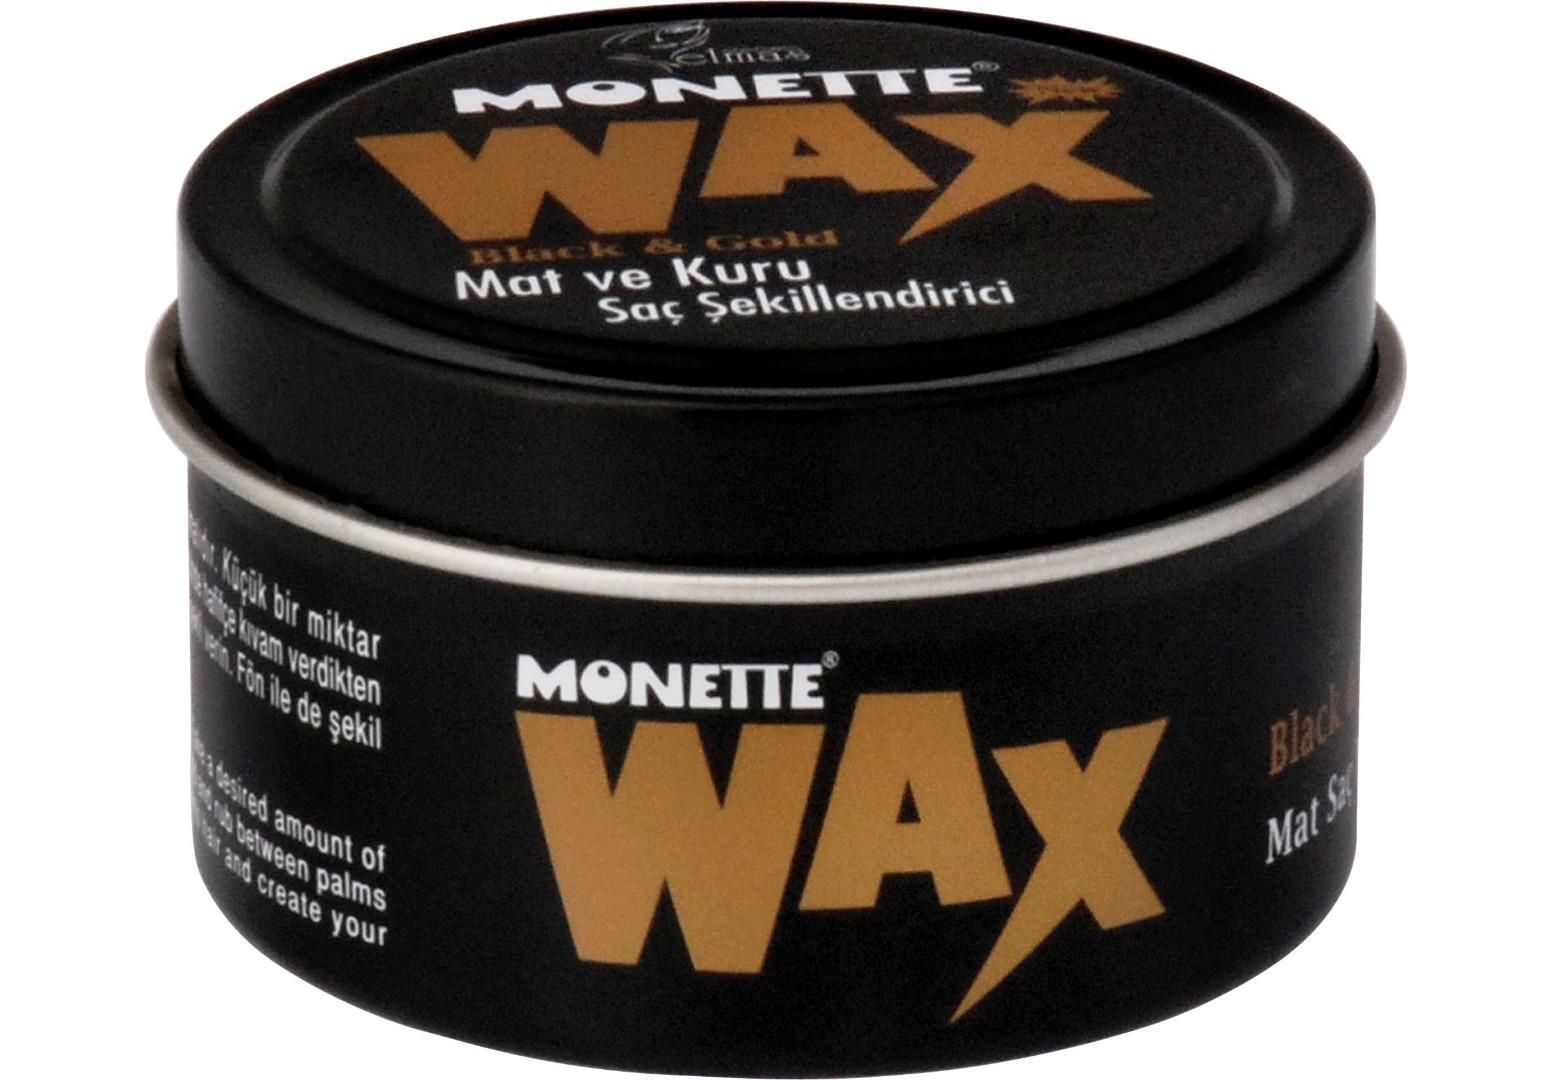 Monette - 49 çapx12 h. - Metal Teneke Kutu - Yuvarlak - Kozmetik